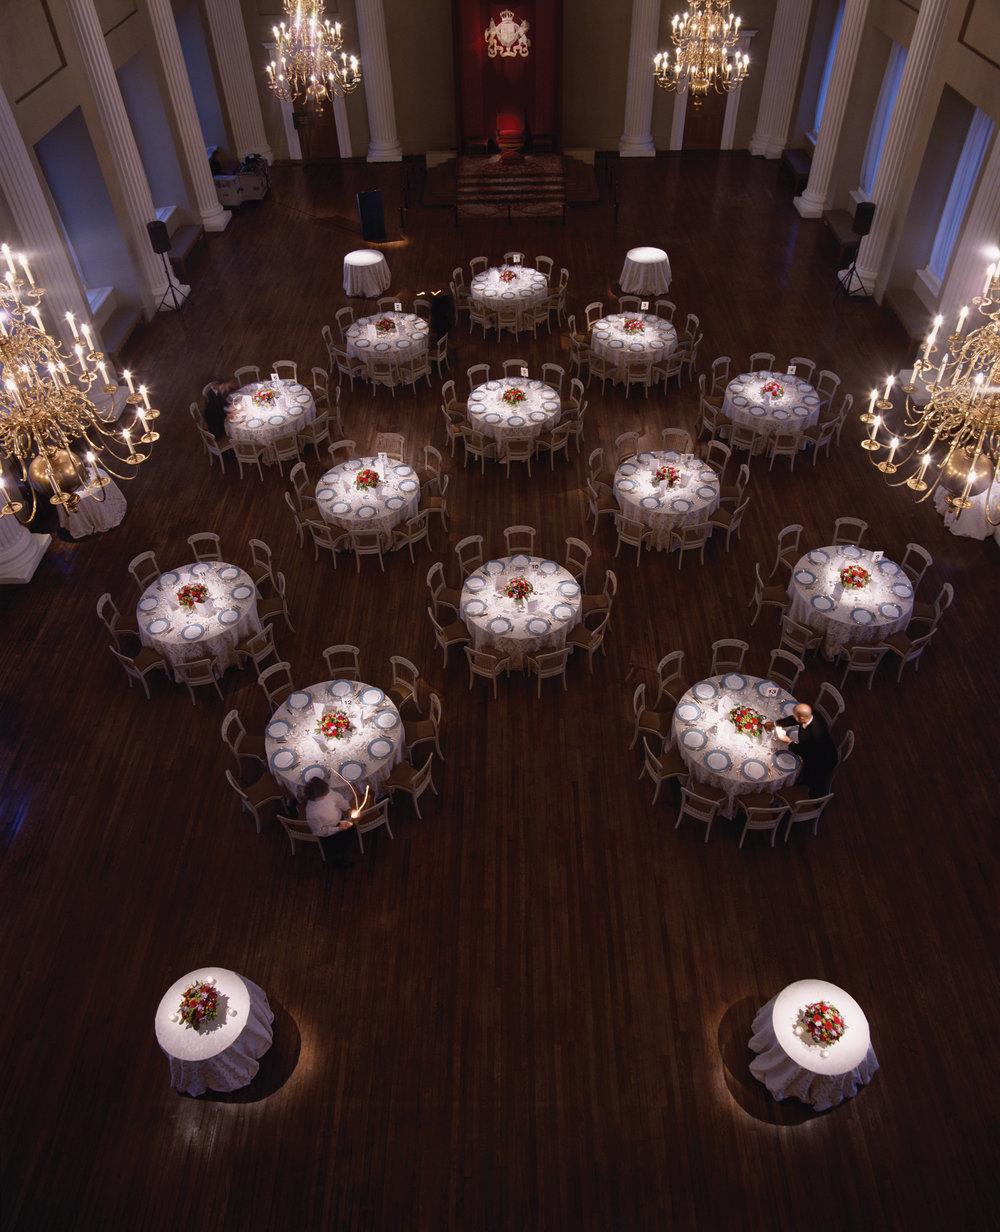 001_banqueting house_london_rgb.jpg